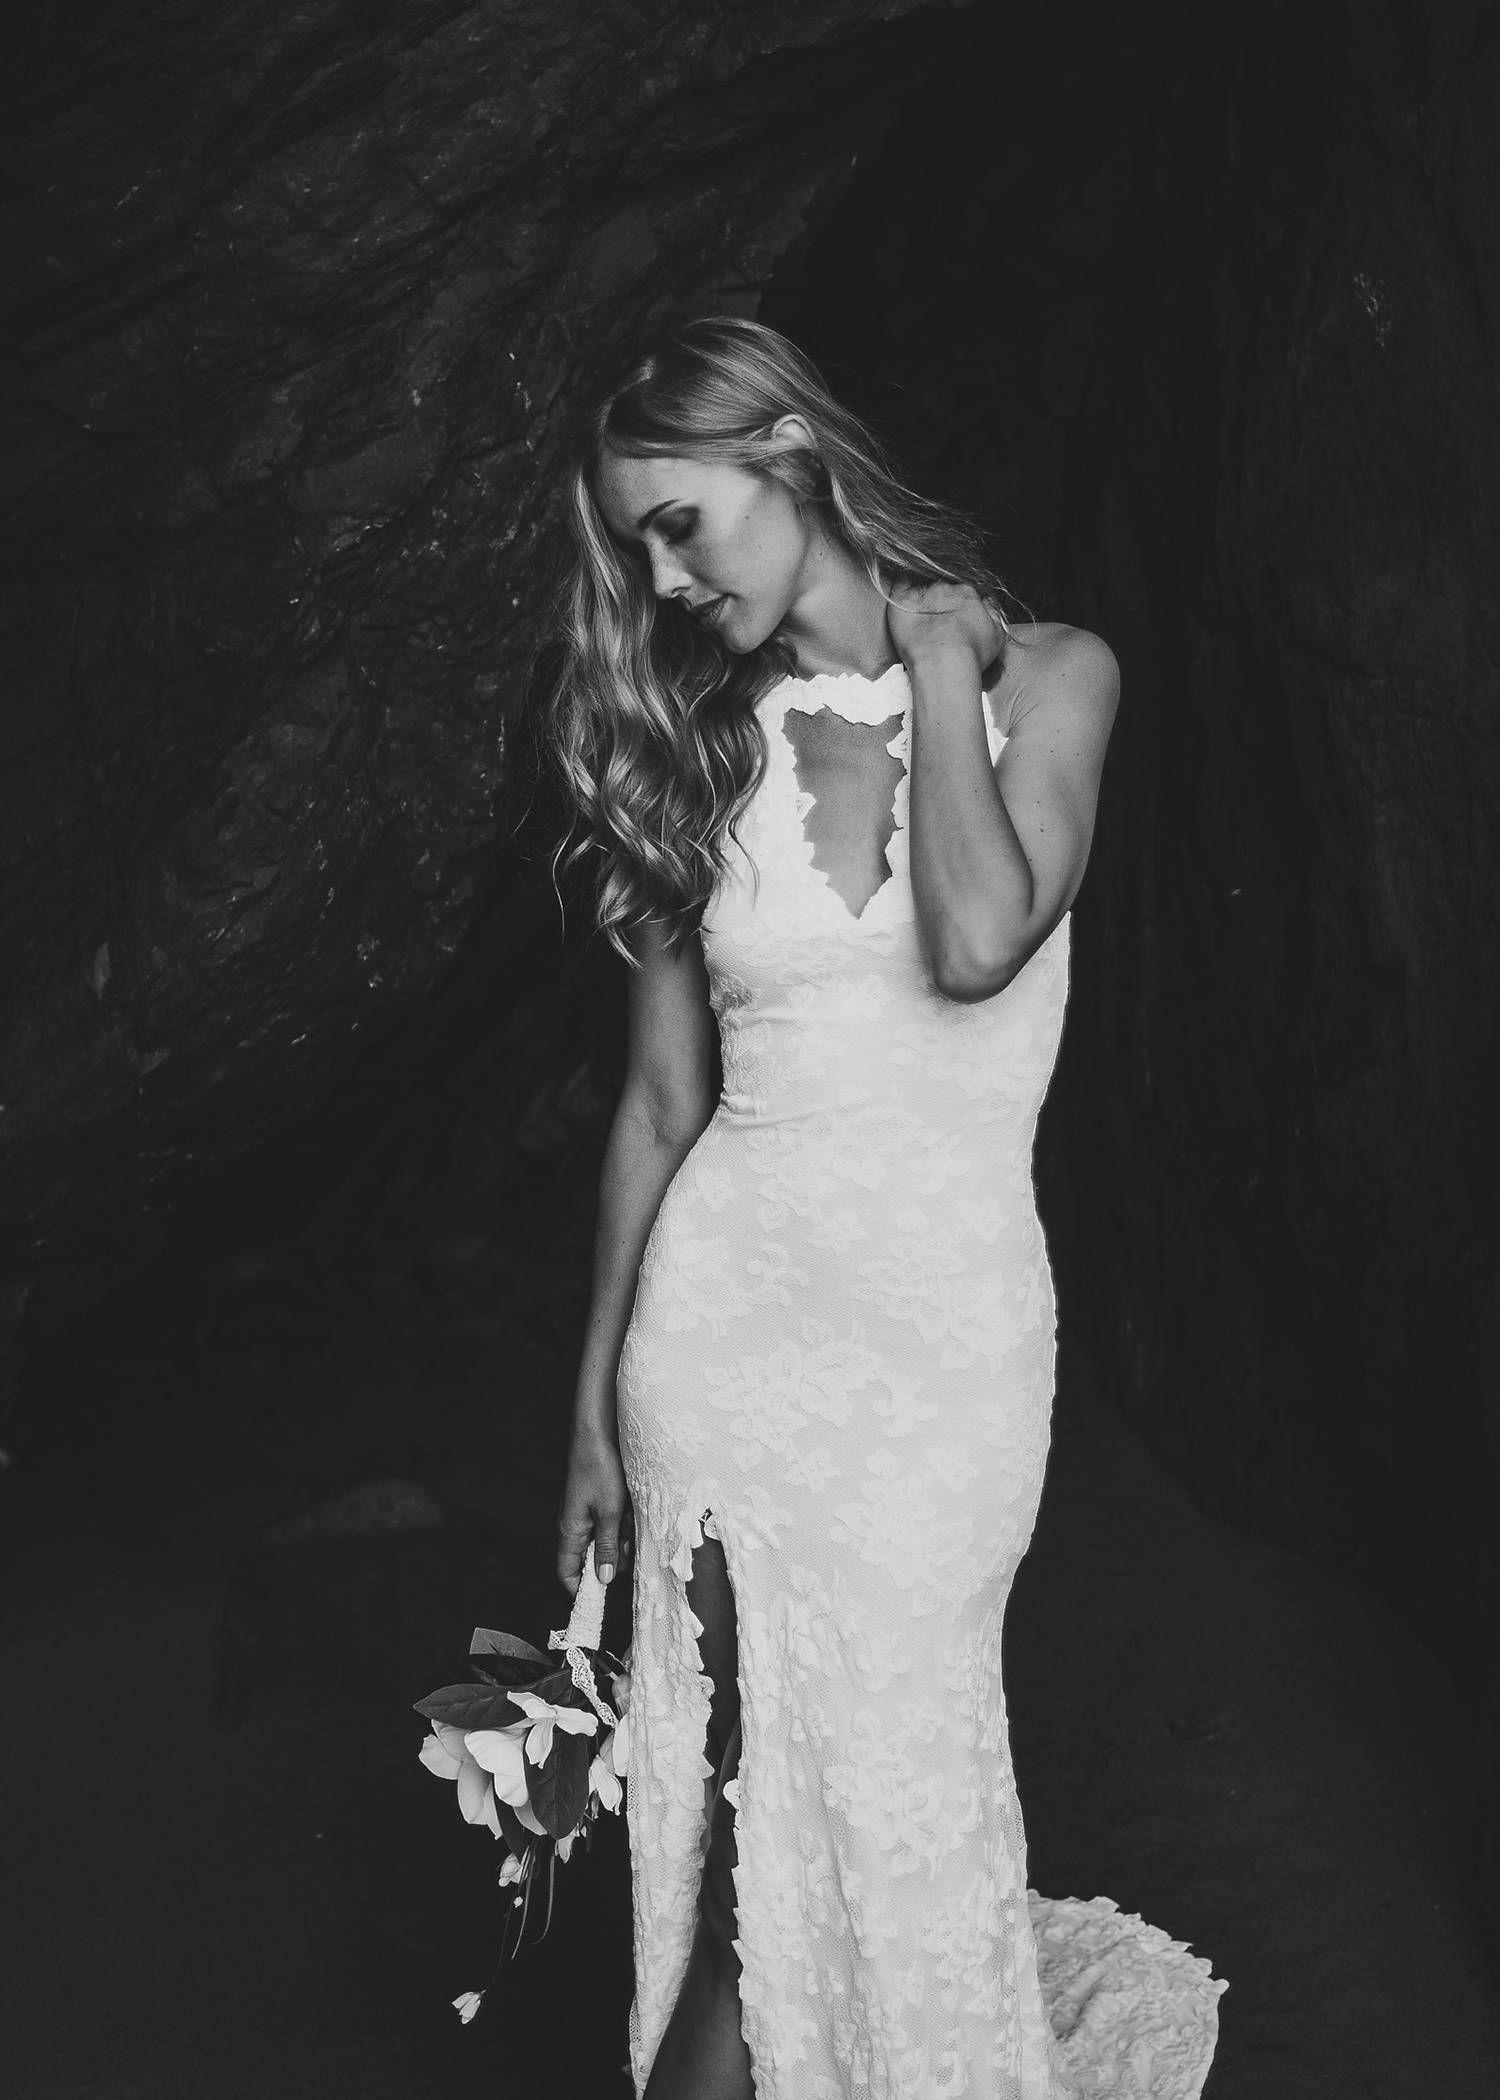 Boho wedding dress racerback wedding dress cutout wedding dress